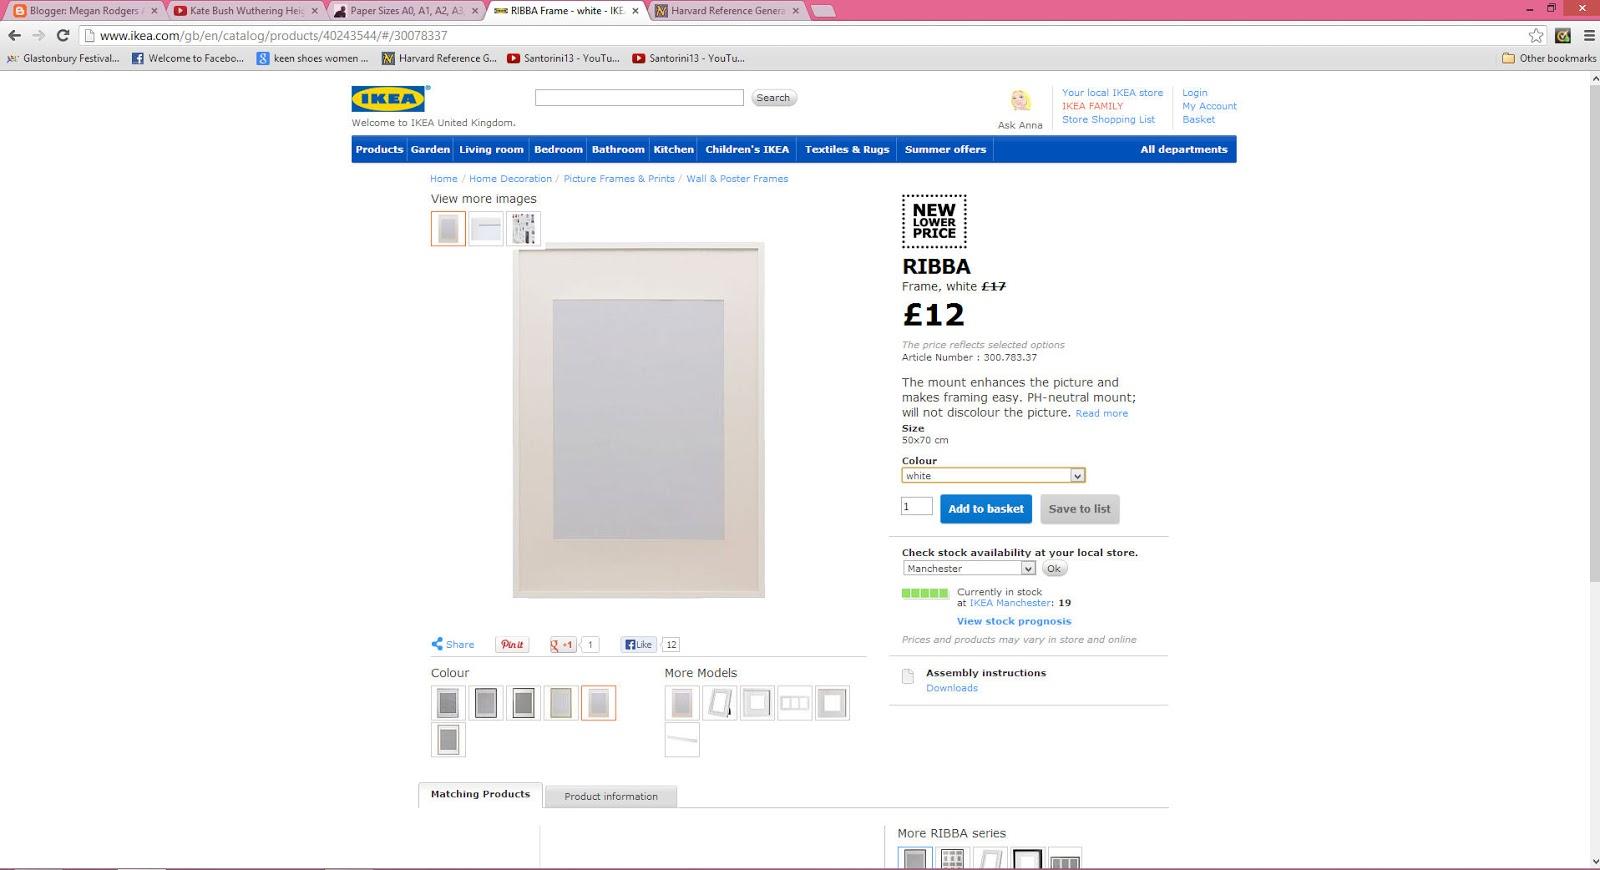 Megan rodgers art blog ikea ribba frames series a1 16 w70 x h100cm jeuxipadfo Gallery